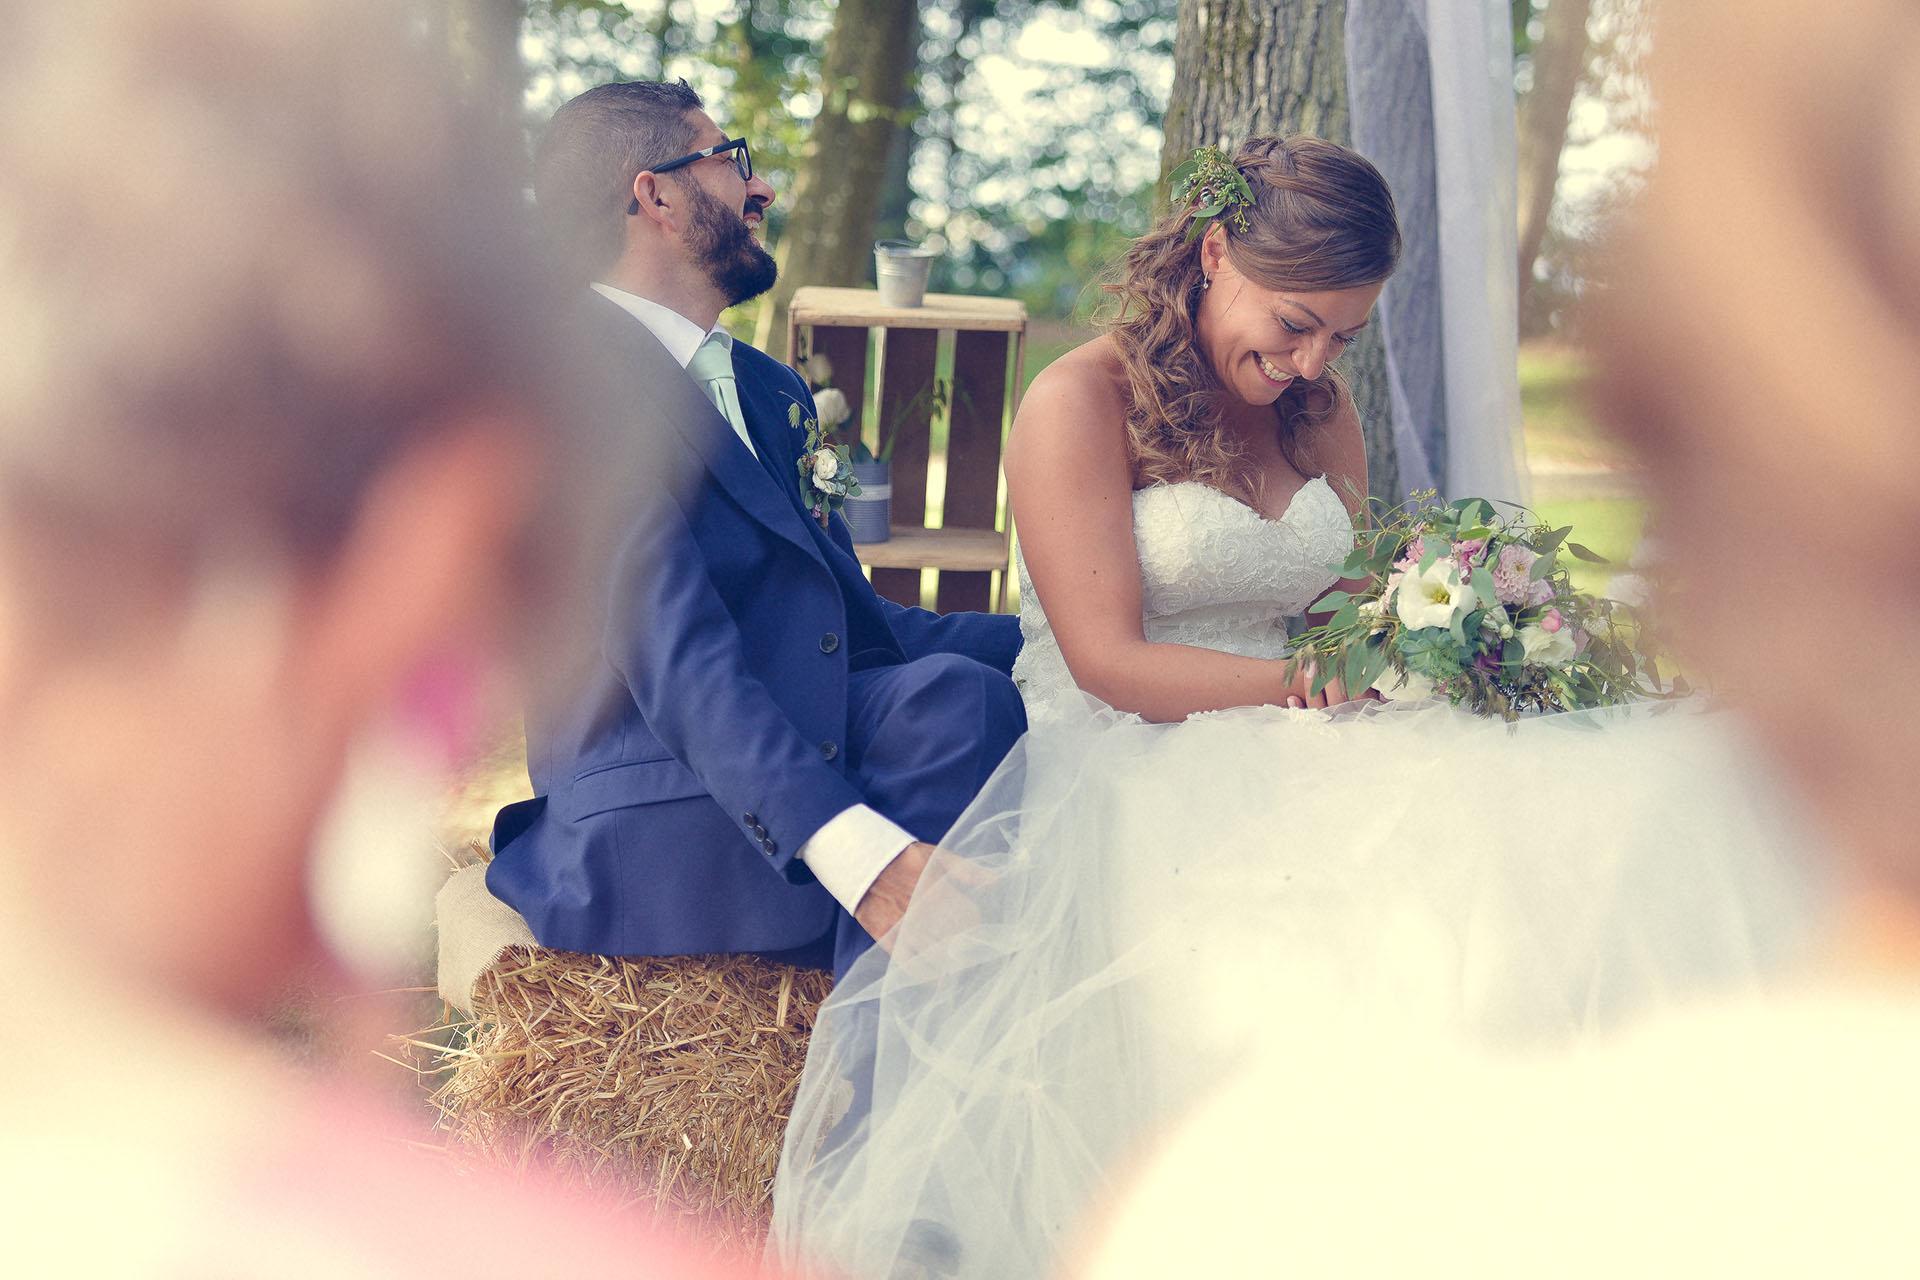 photographe-maya-angelsen-mariage-ile-de-france-essonne